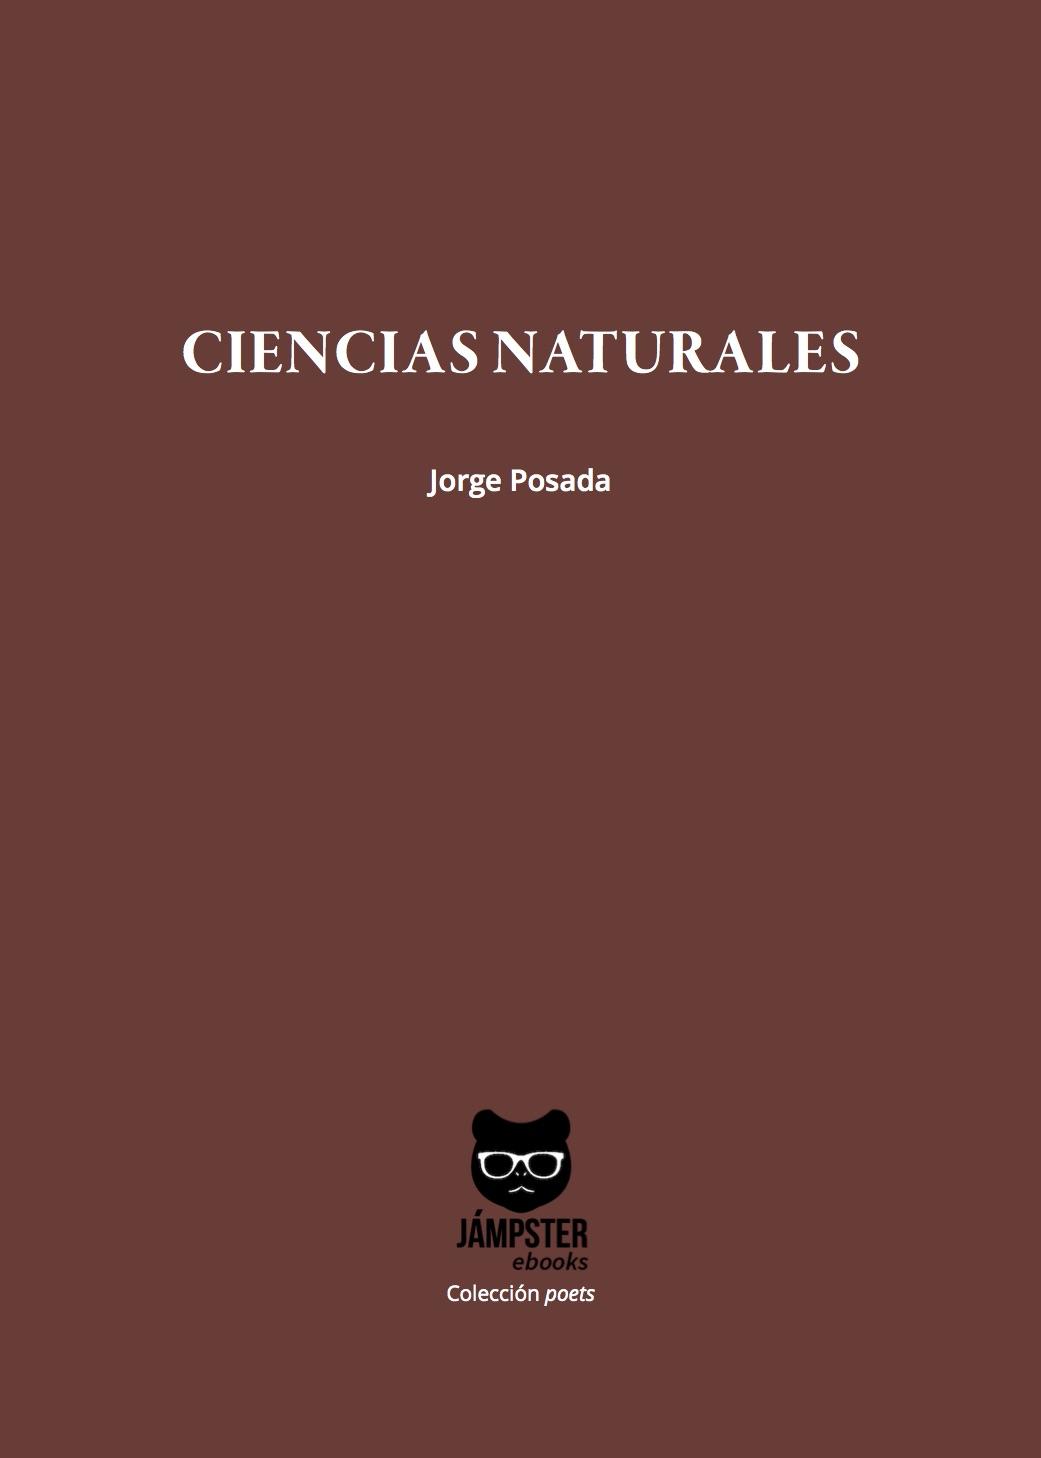 Ciencias Naturales - Jorge Posada [Portada]